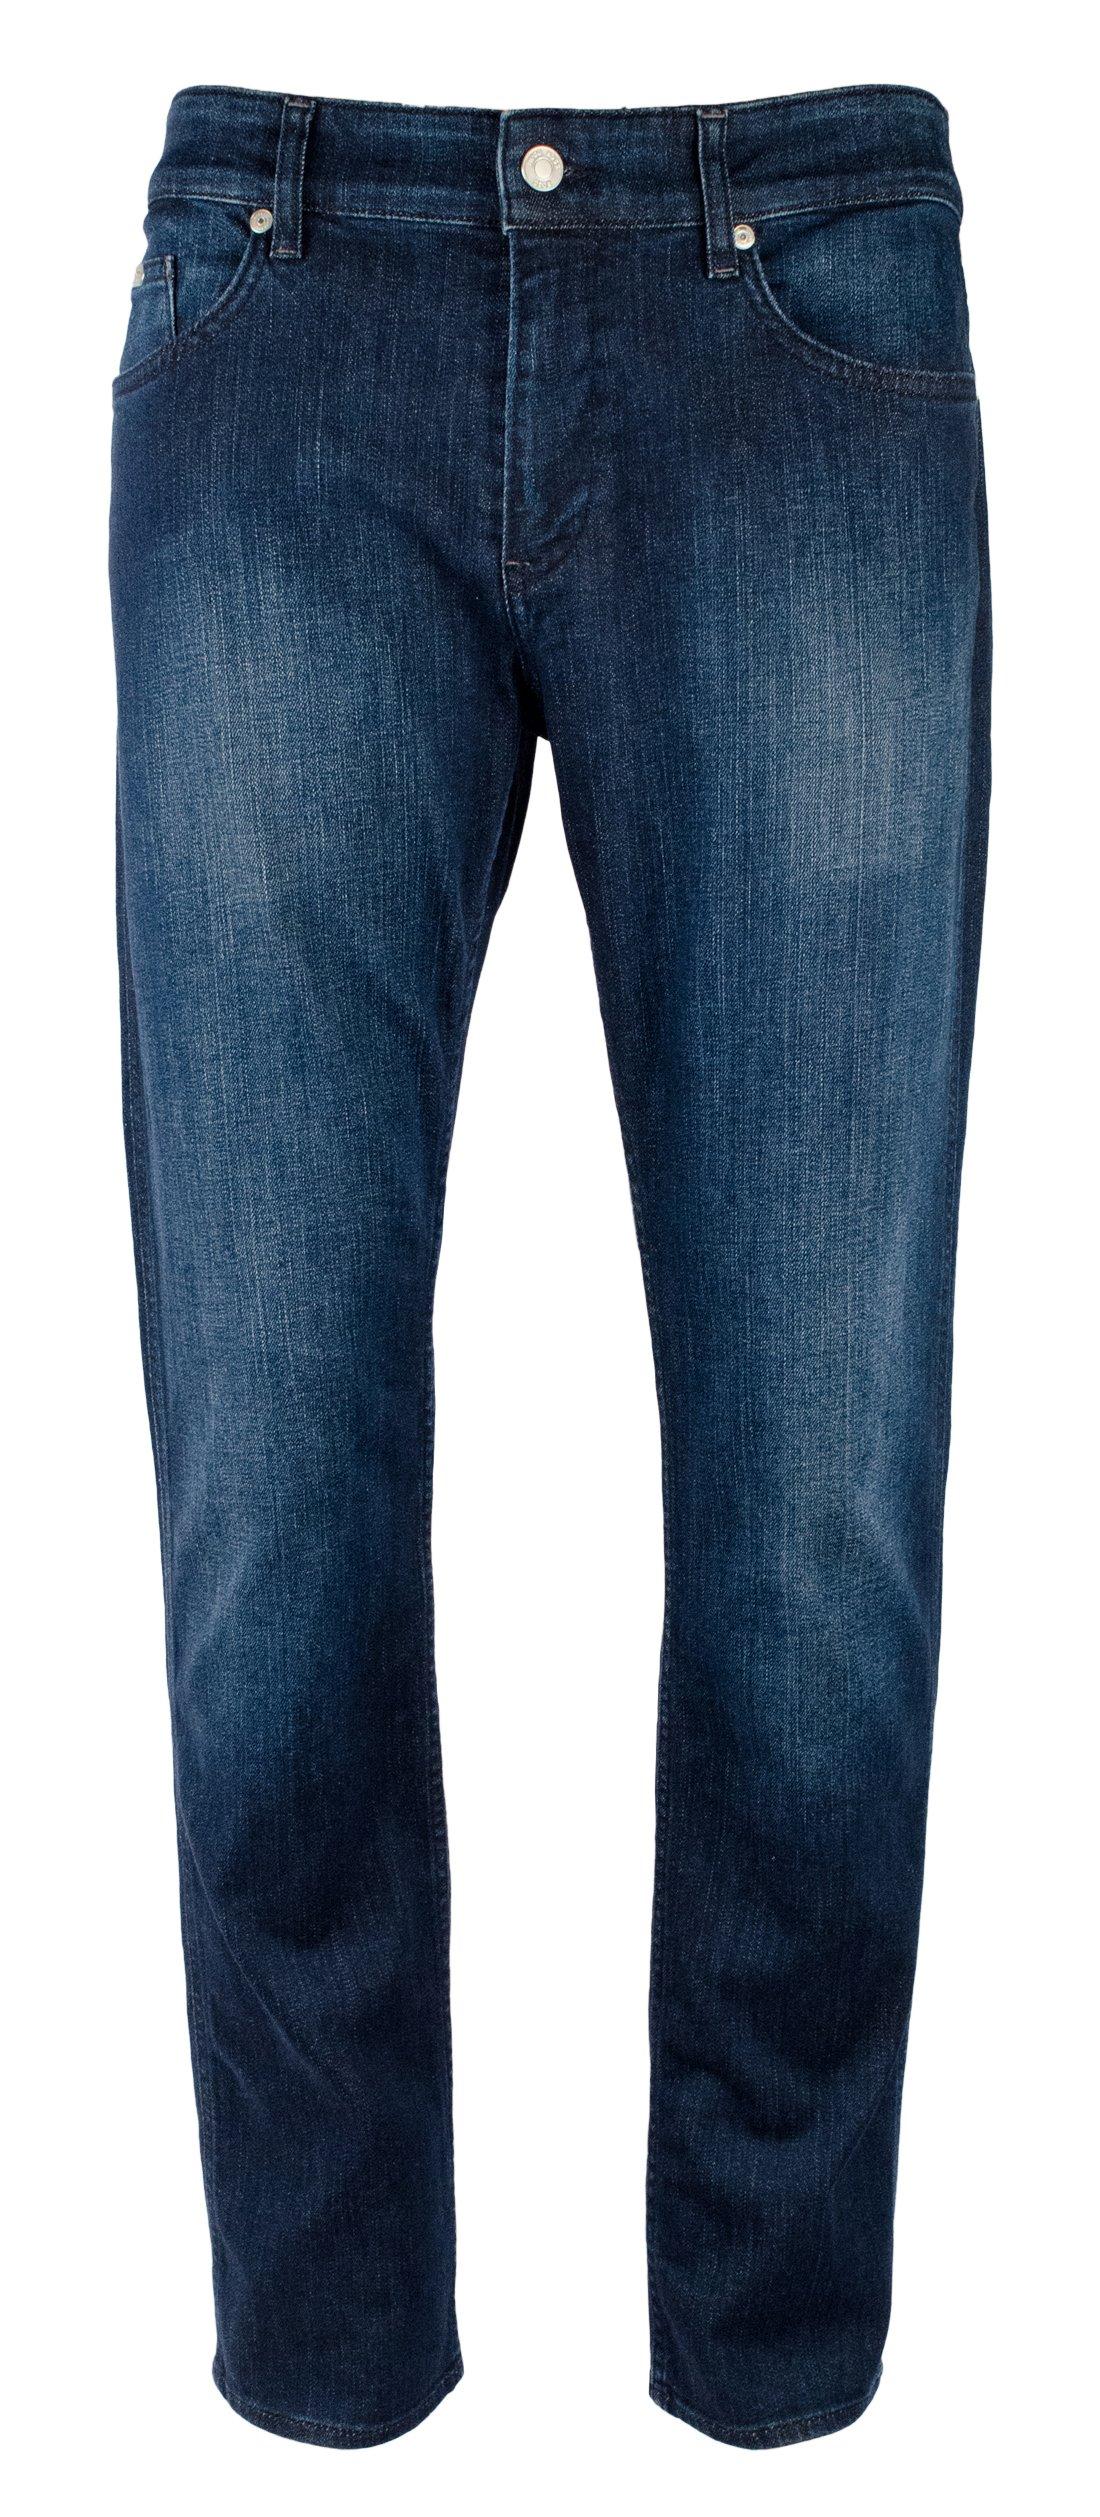 Hugo Boss Men's C-Delaware Slim Fit Jeans (Denim, 34 x 32)